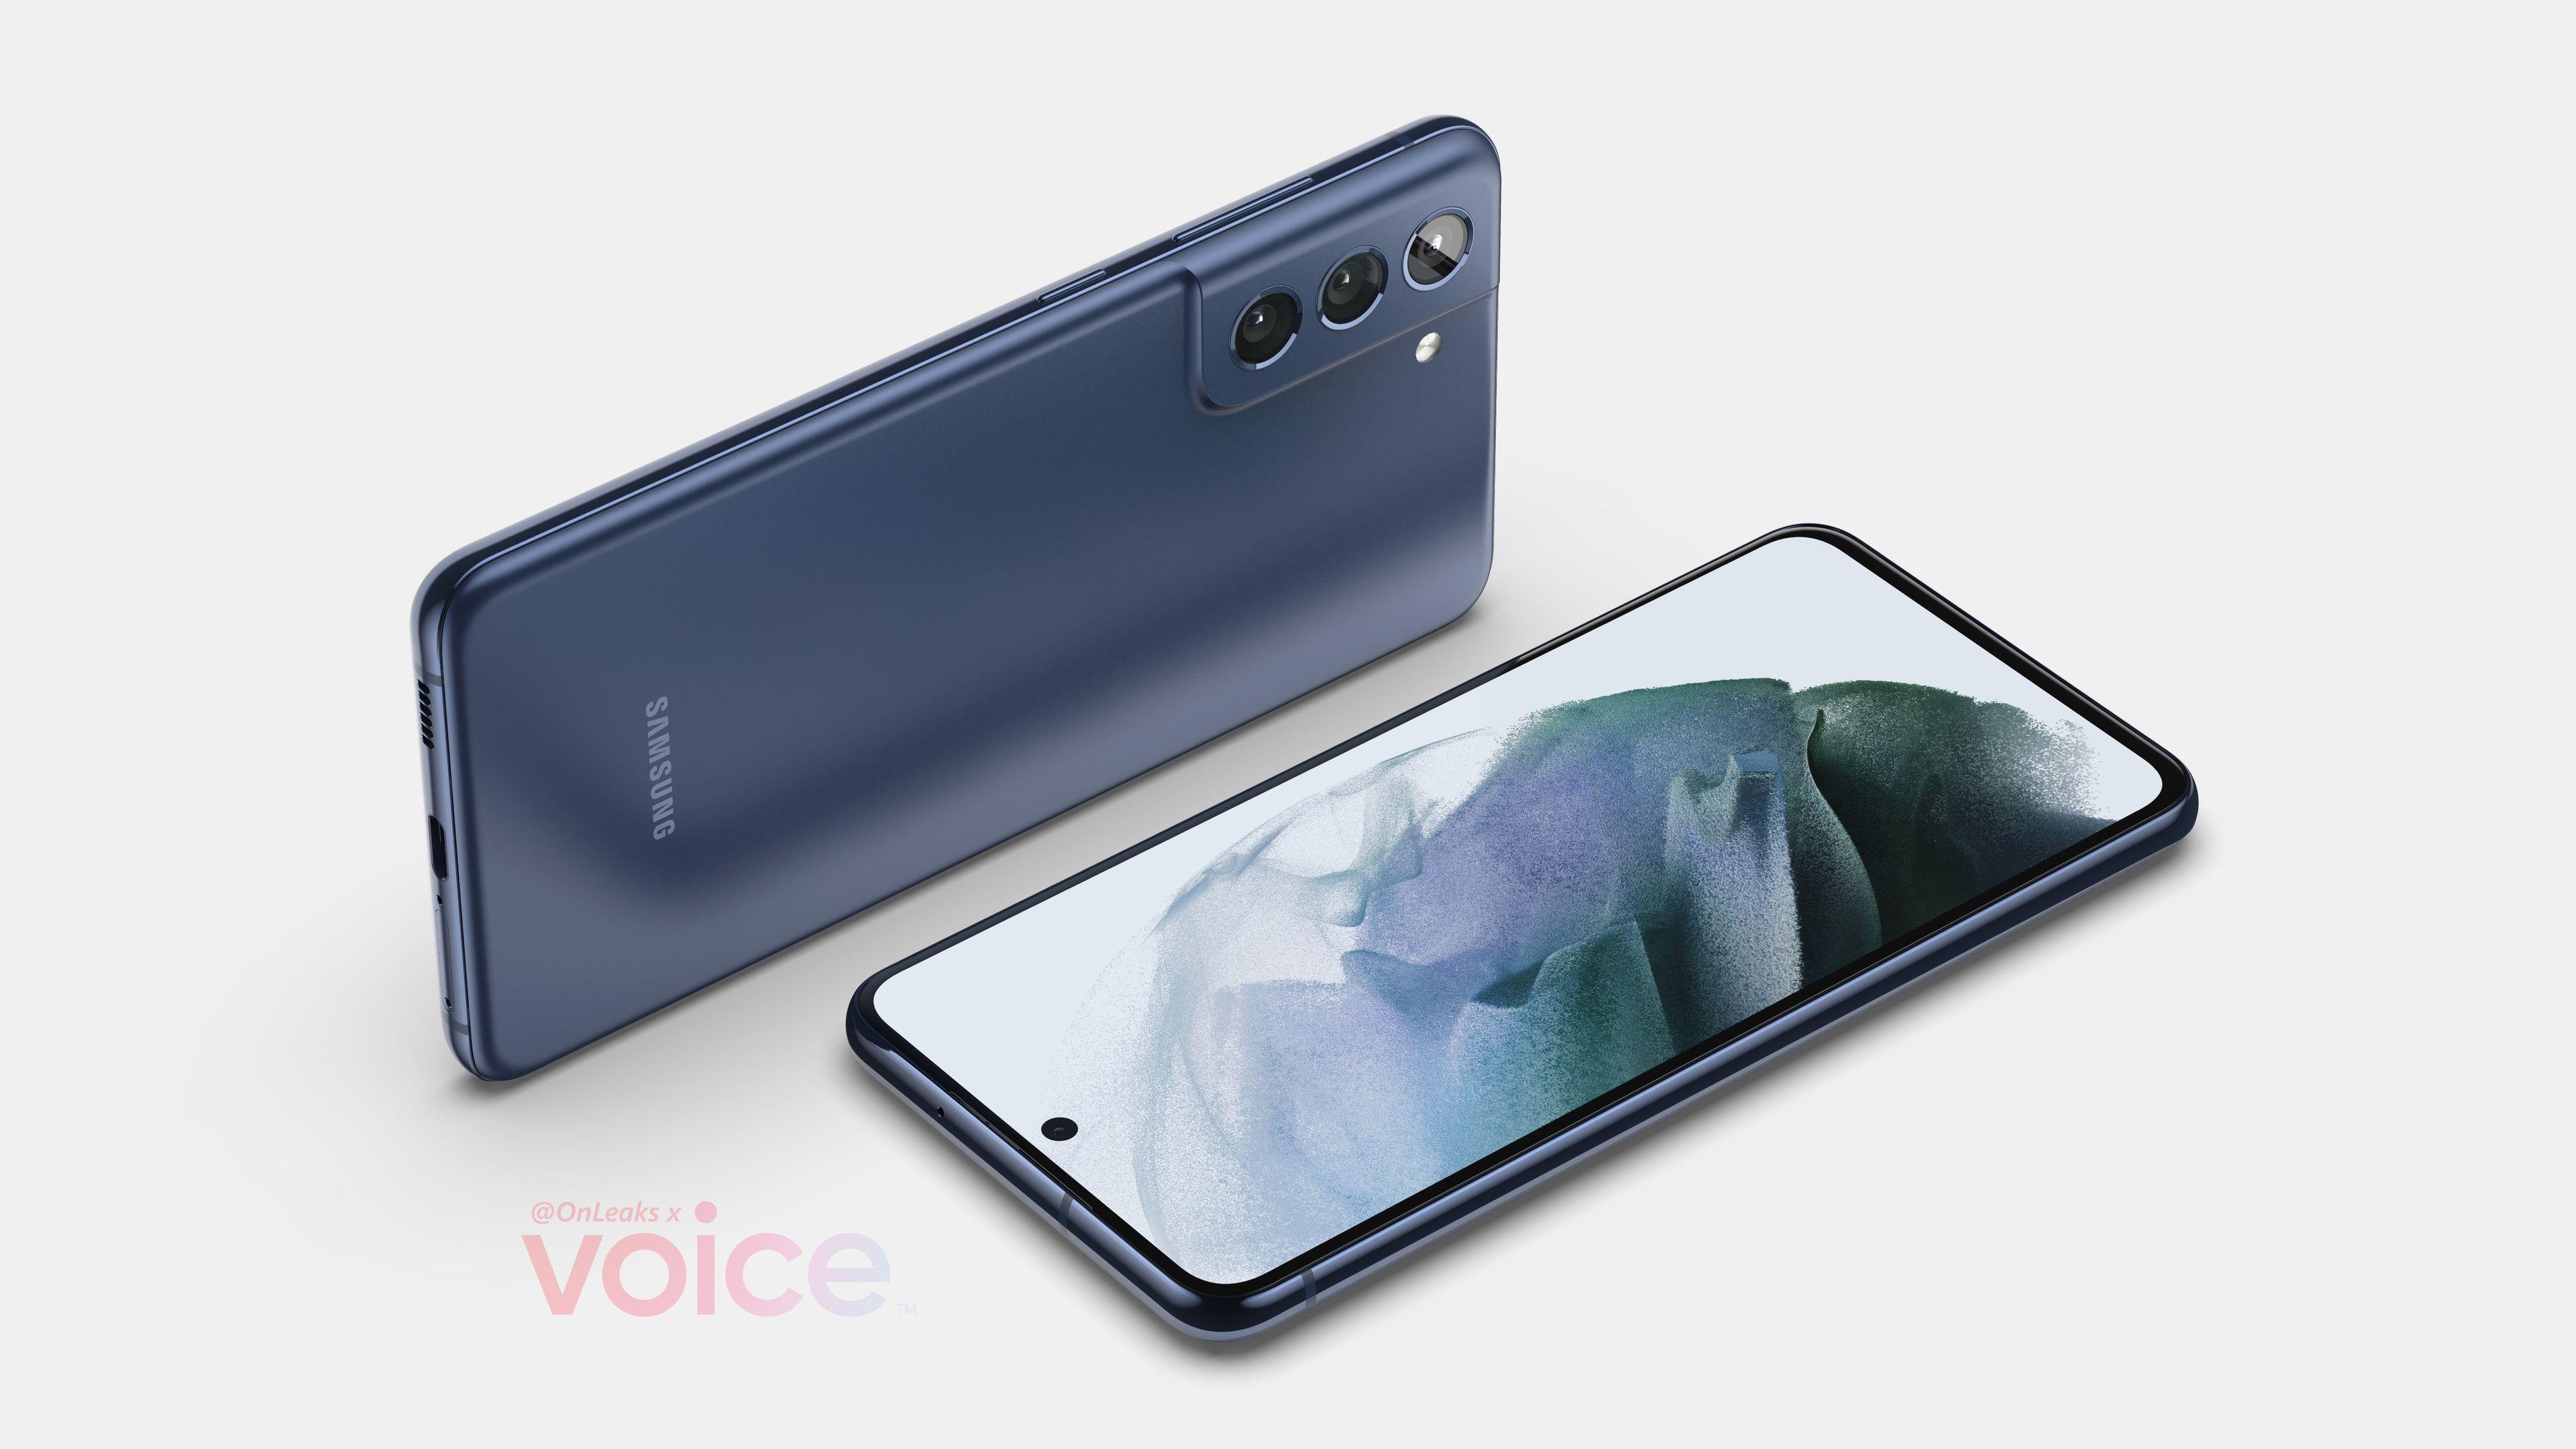 Samsung Galaxy S21 FE на рендерах: почти копия Galaxy S21, но крупнее и дешевле